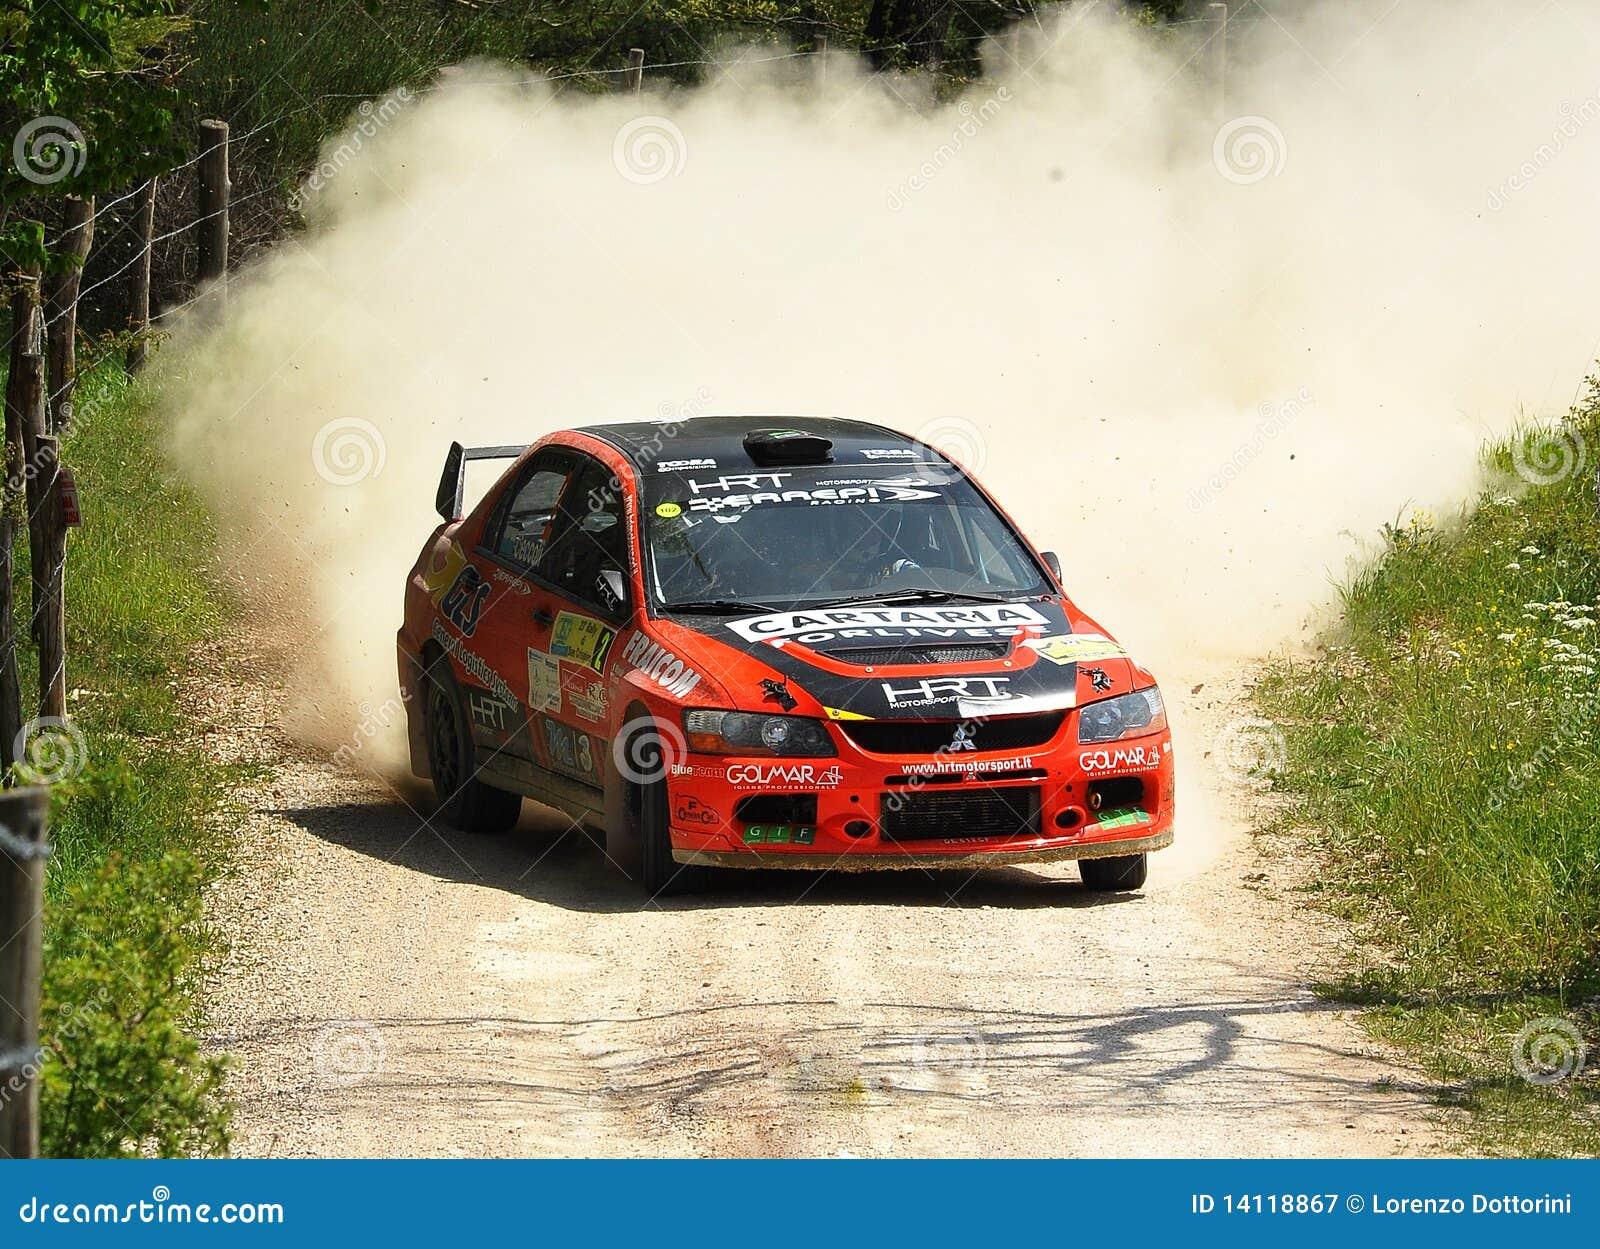 Mitsubishi Lancer Evo IX Rally Car Editorial Photography - Image ...